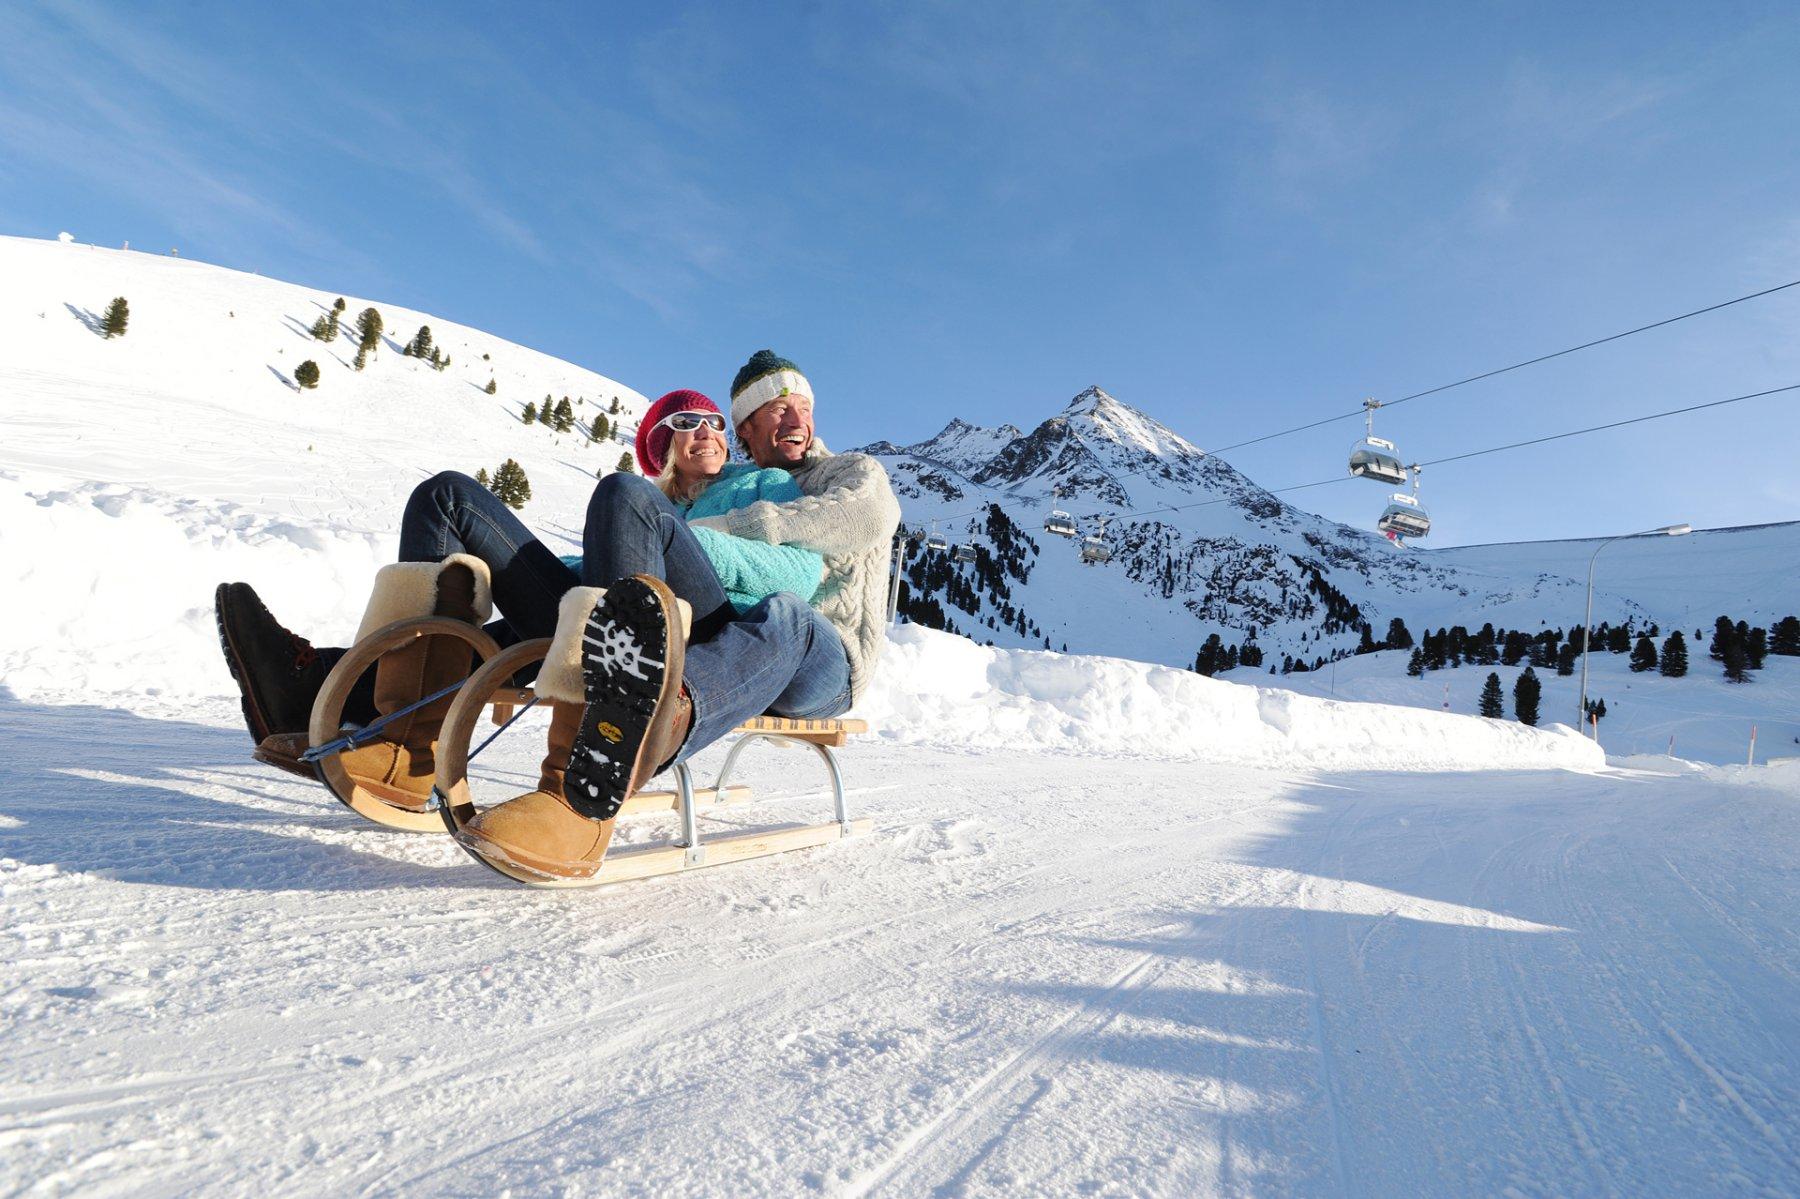 Rodeln Urlaub In K 252 Htai Tirol